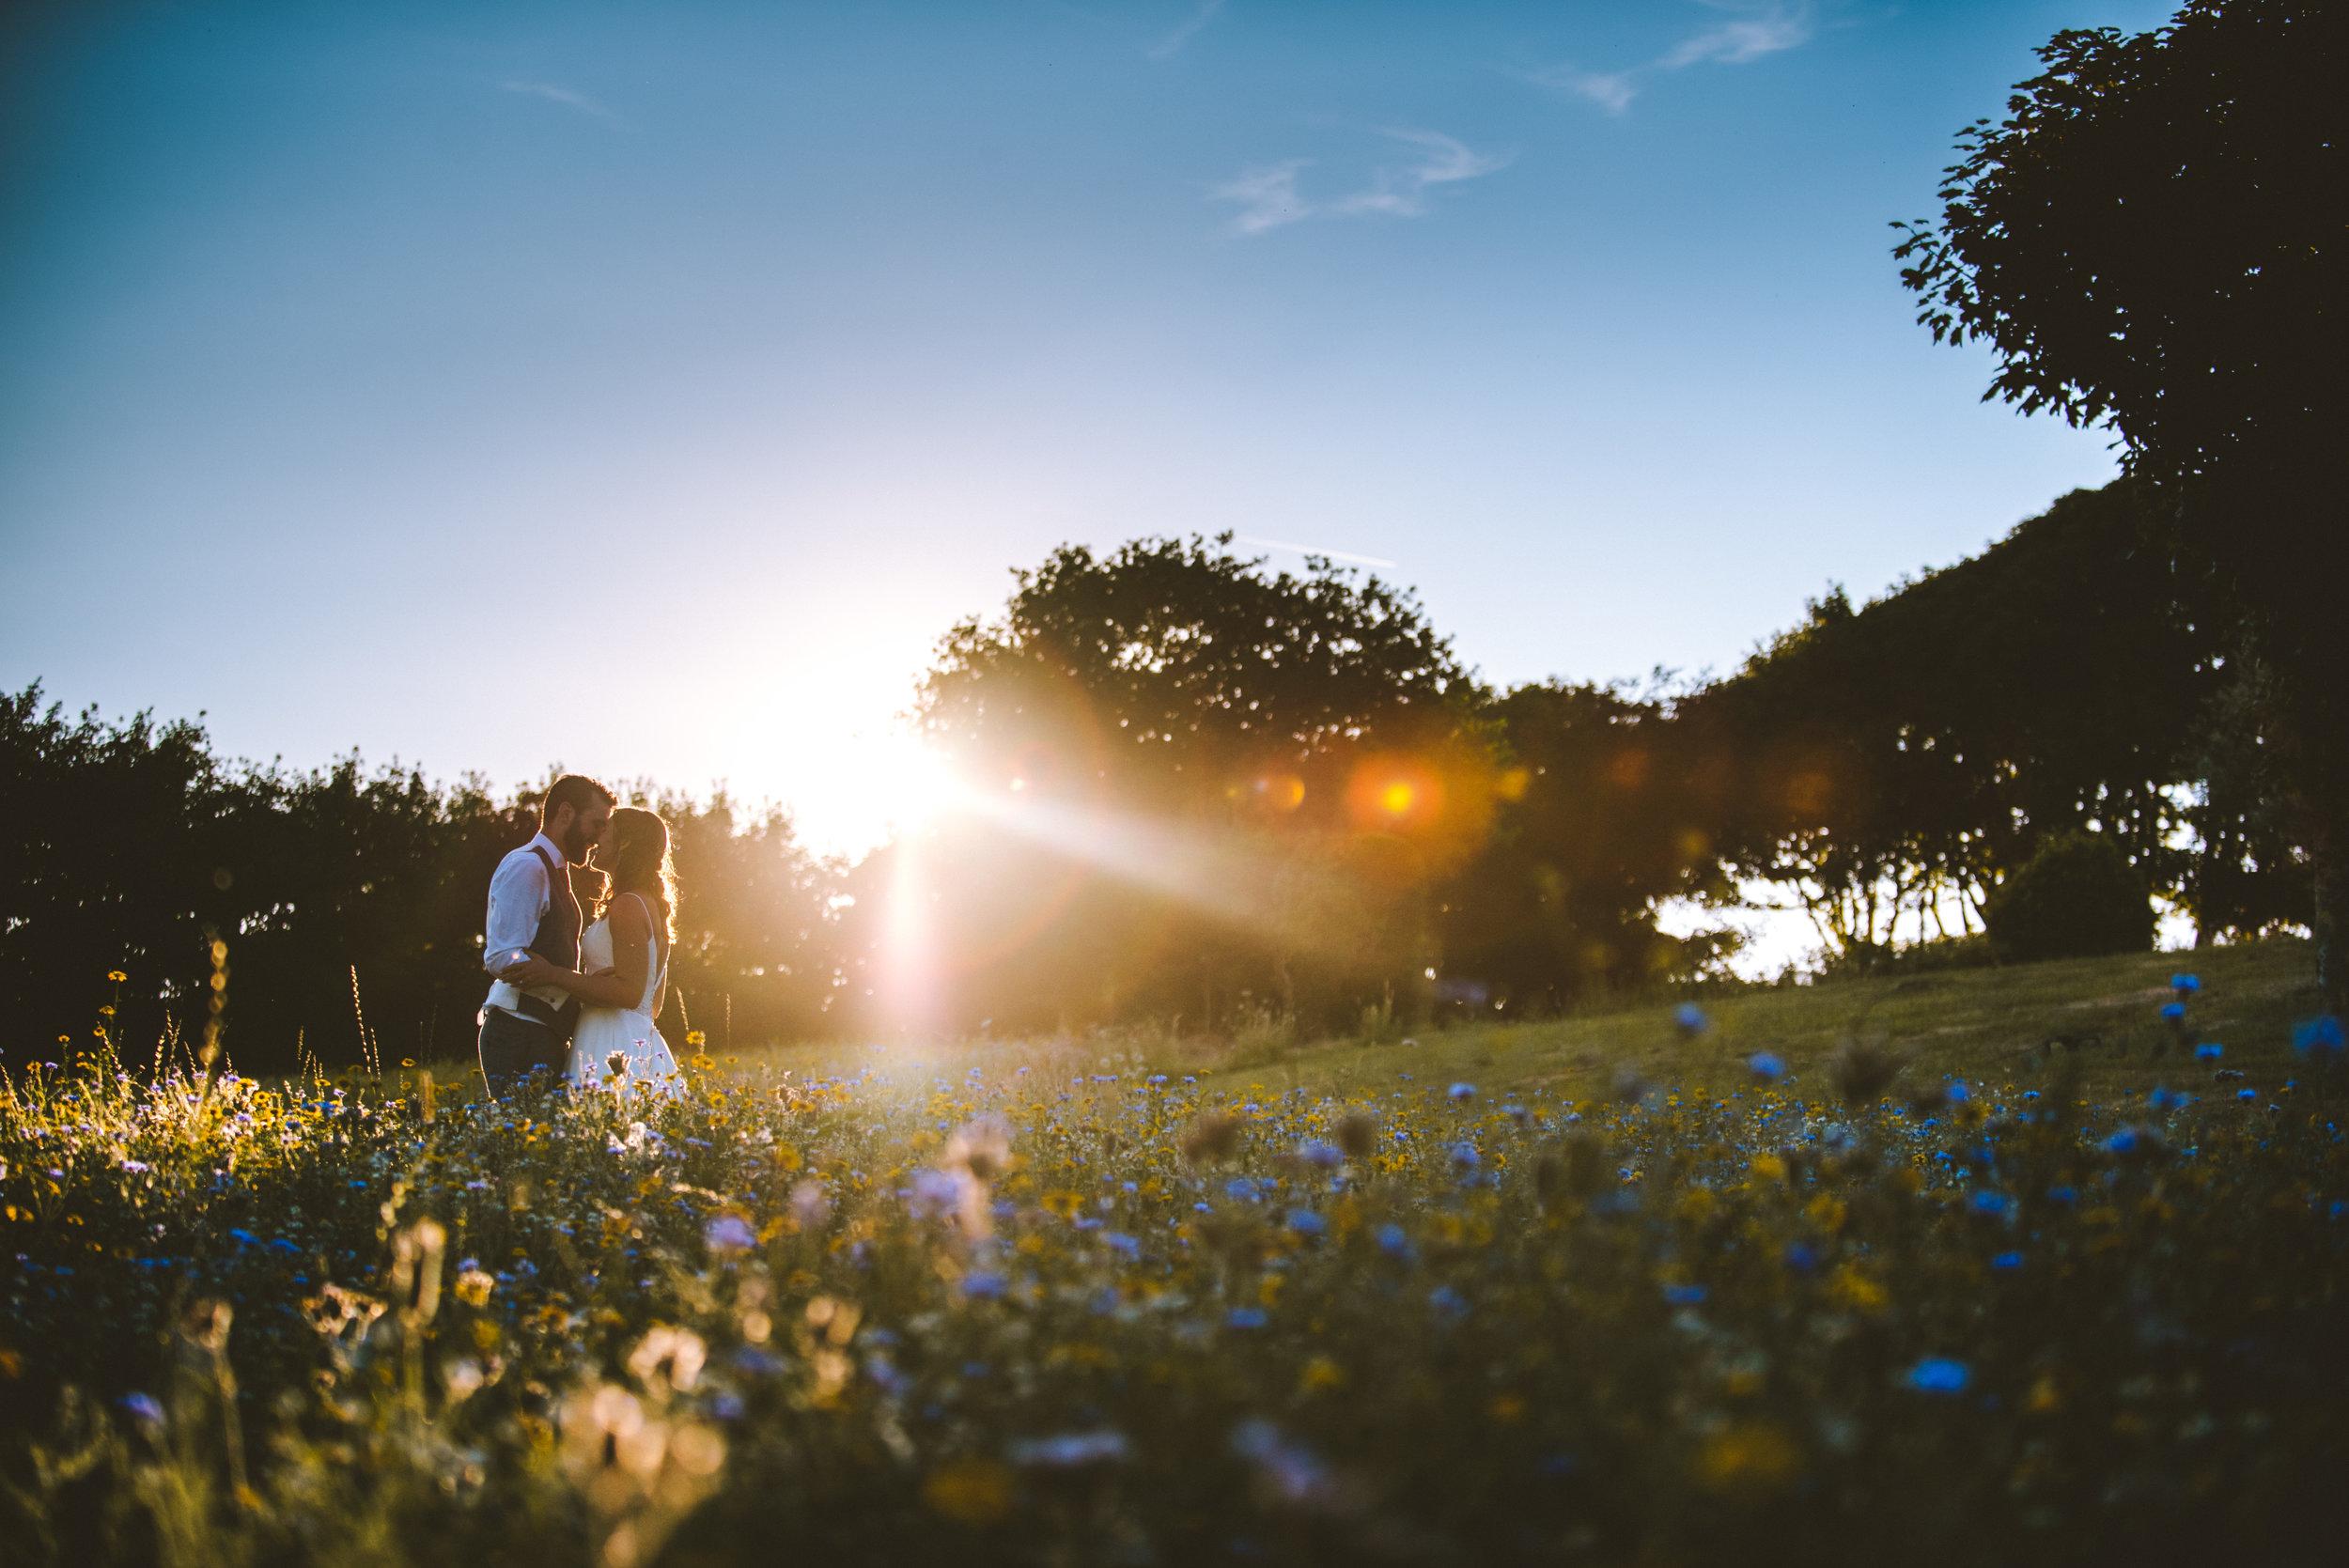 ashbarton-estate-wedding-photographer-mark-shaw-77.jpg